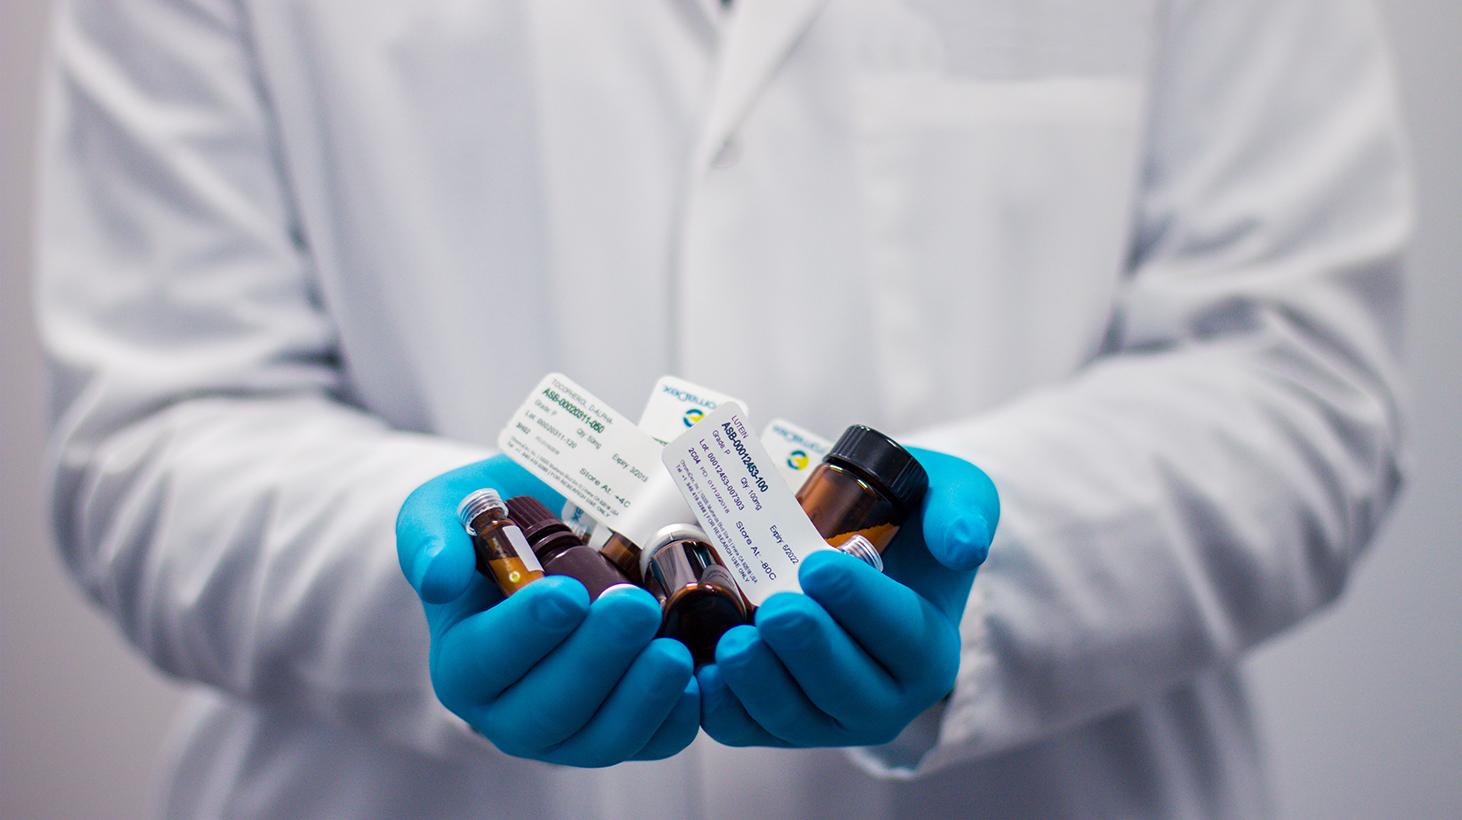 Startup chilena entra a la industria farmacéutica preparando la logística de una futura vacuna Covid19.